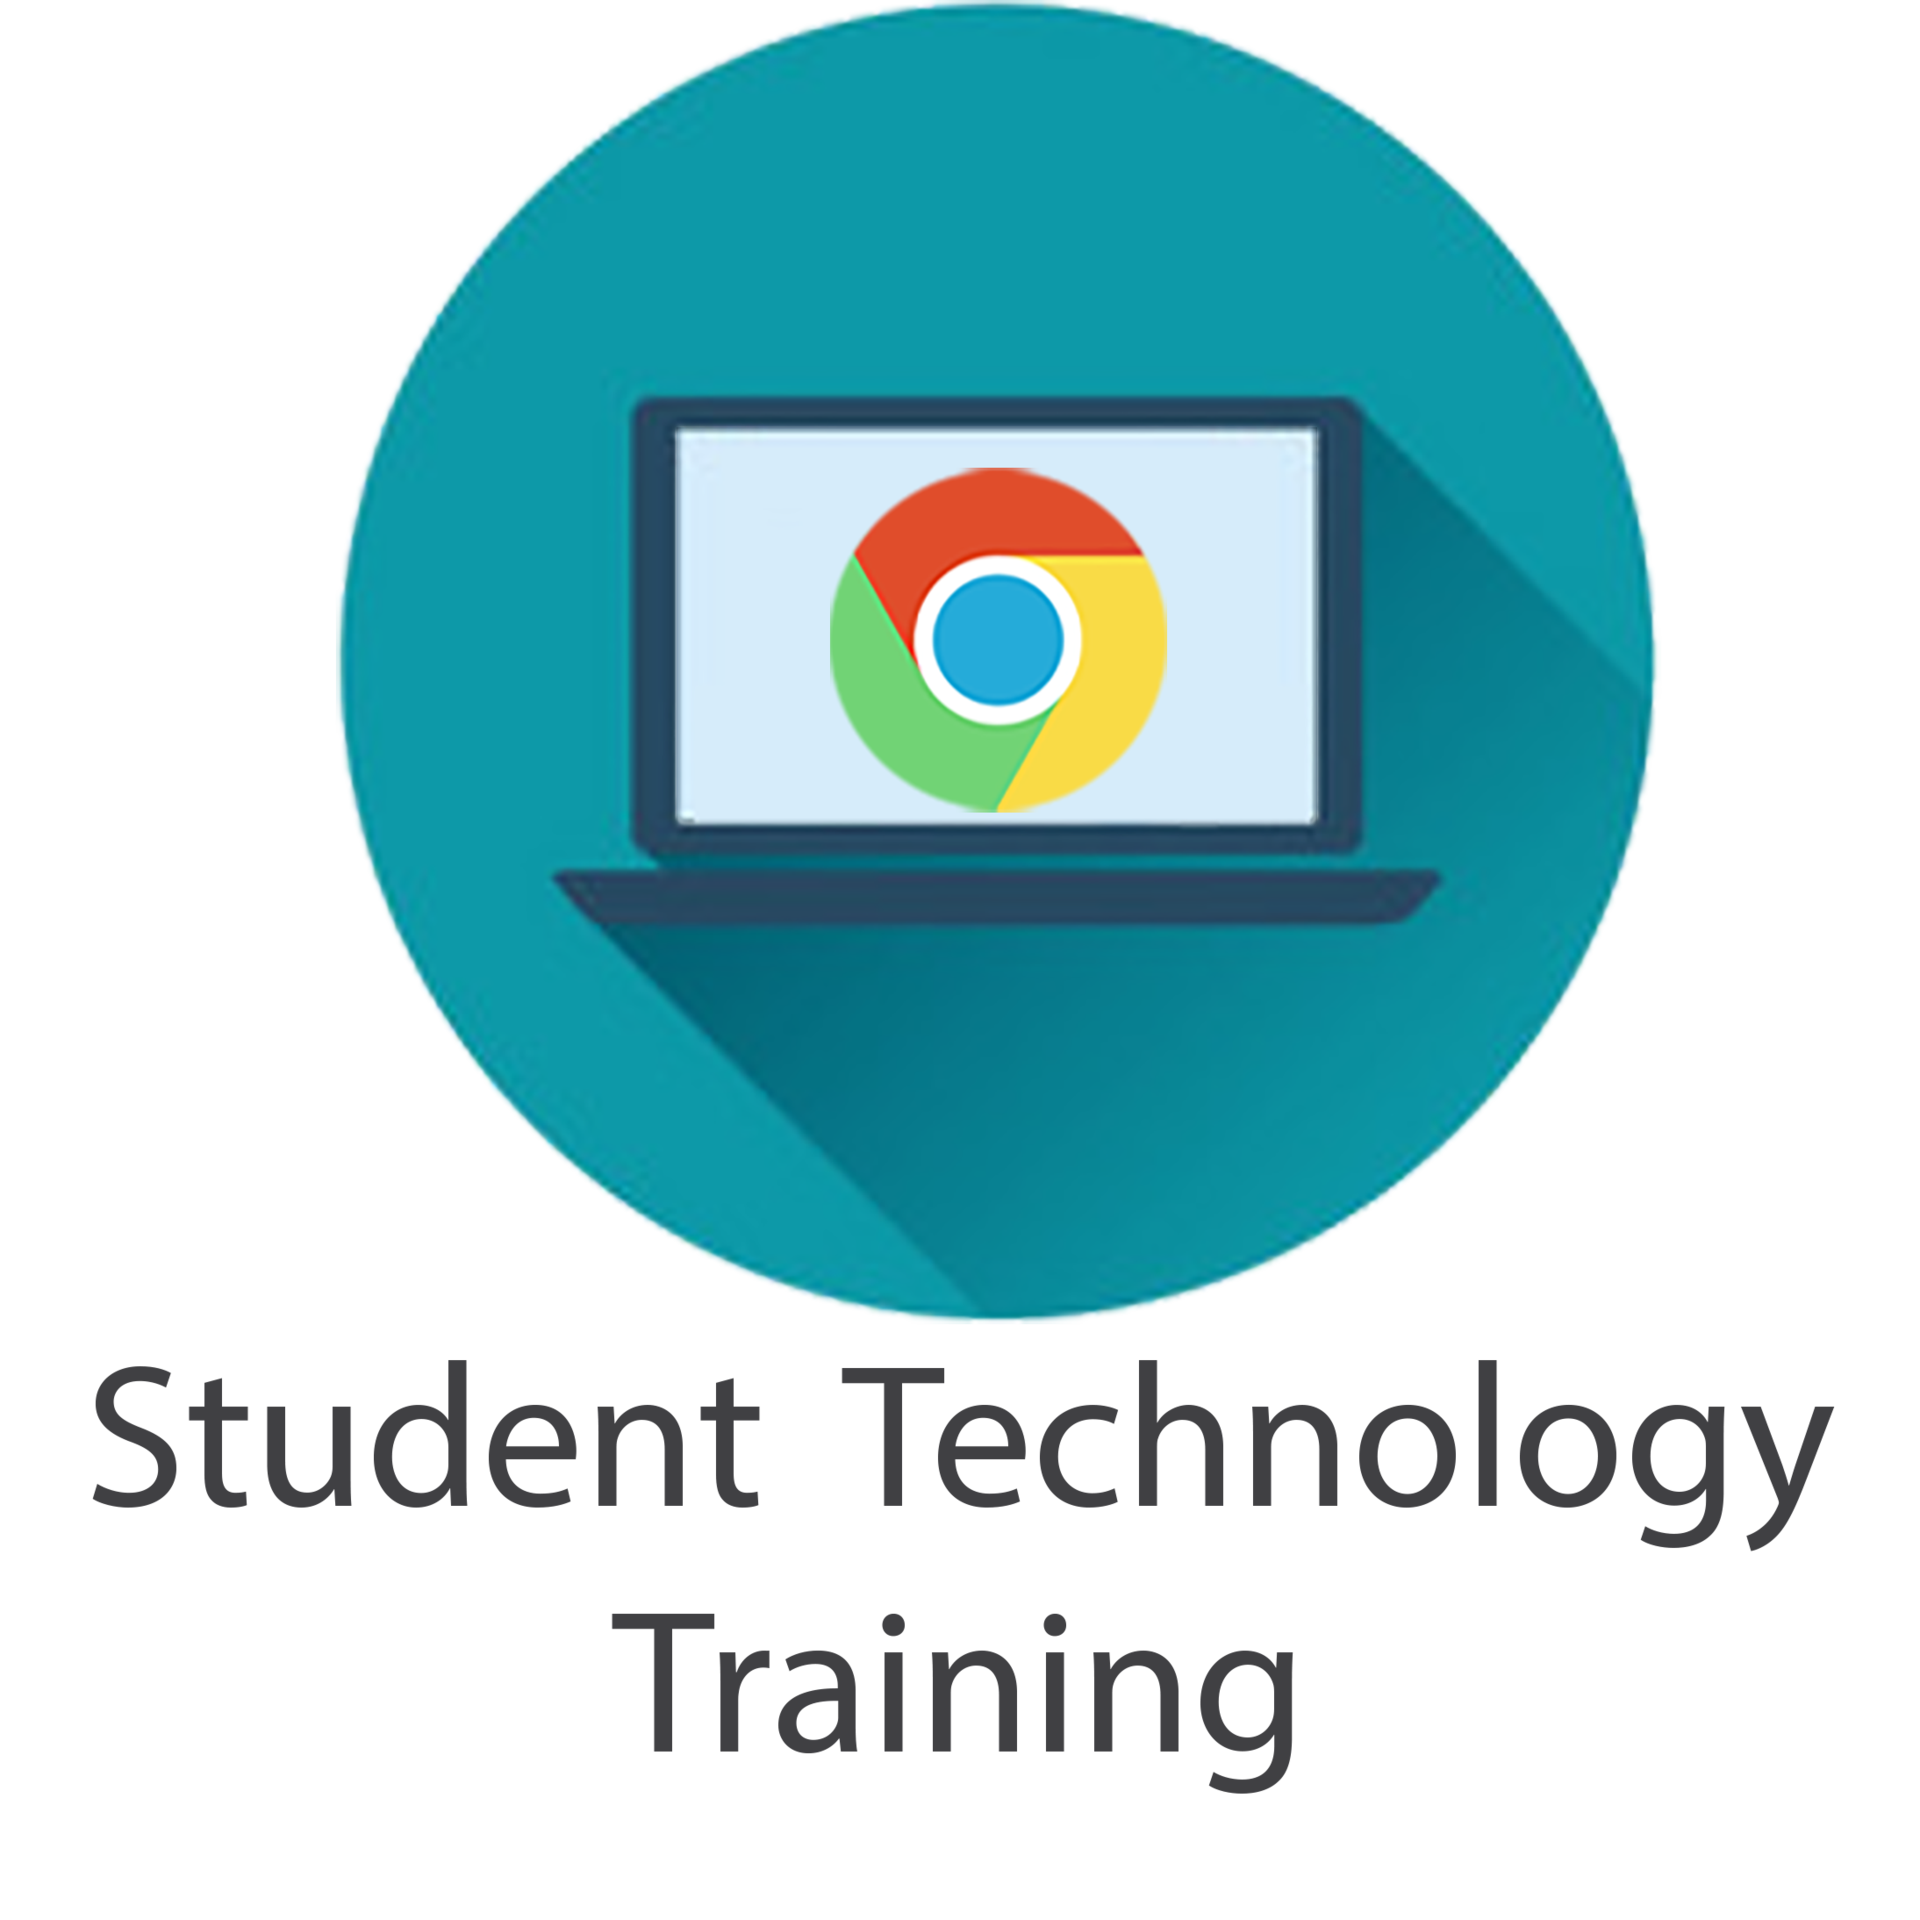 Student Technology Training